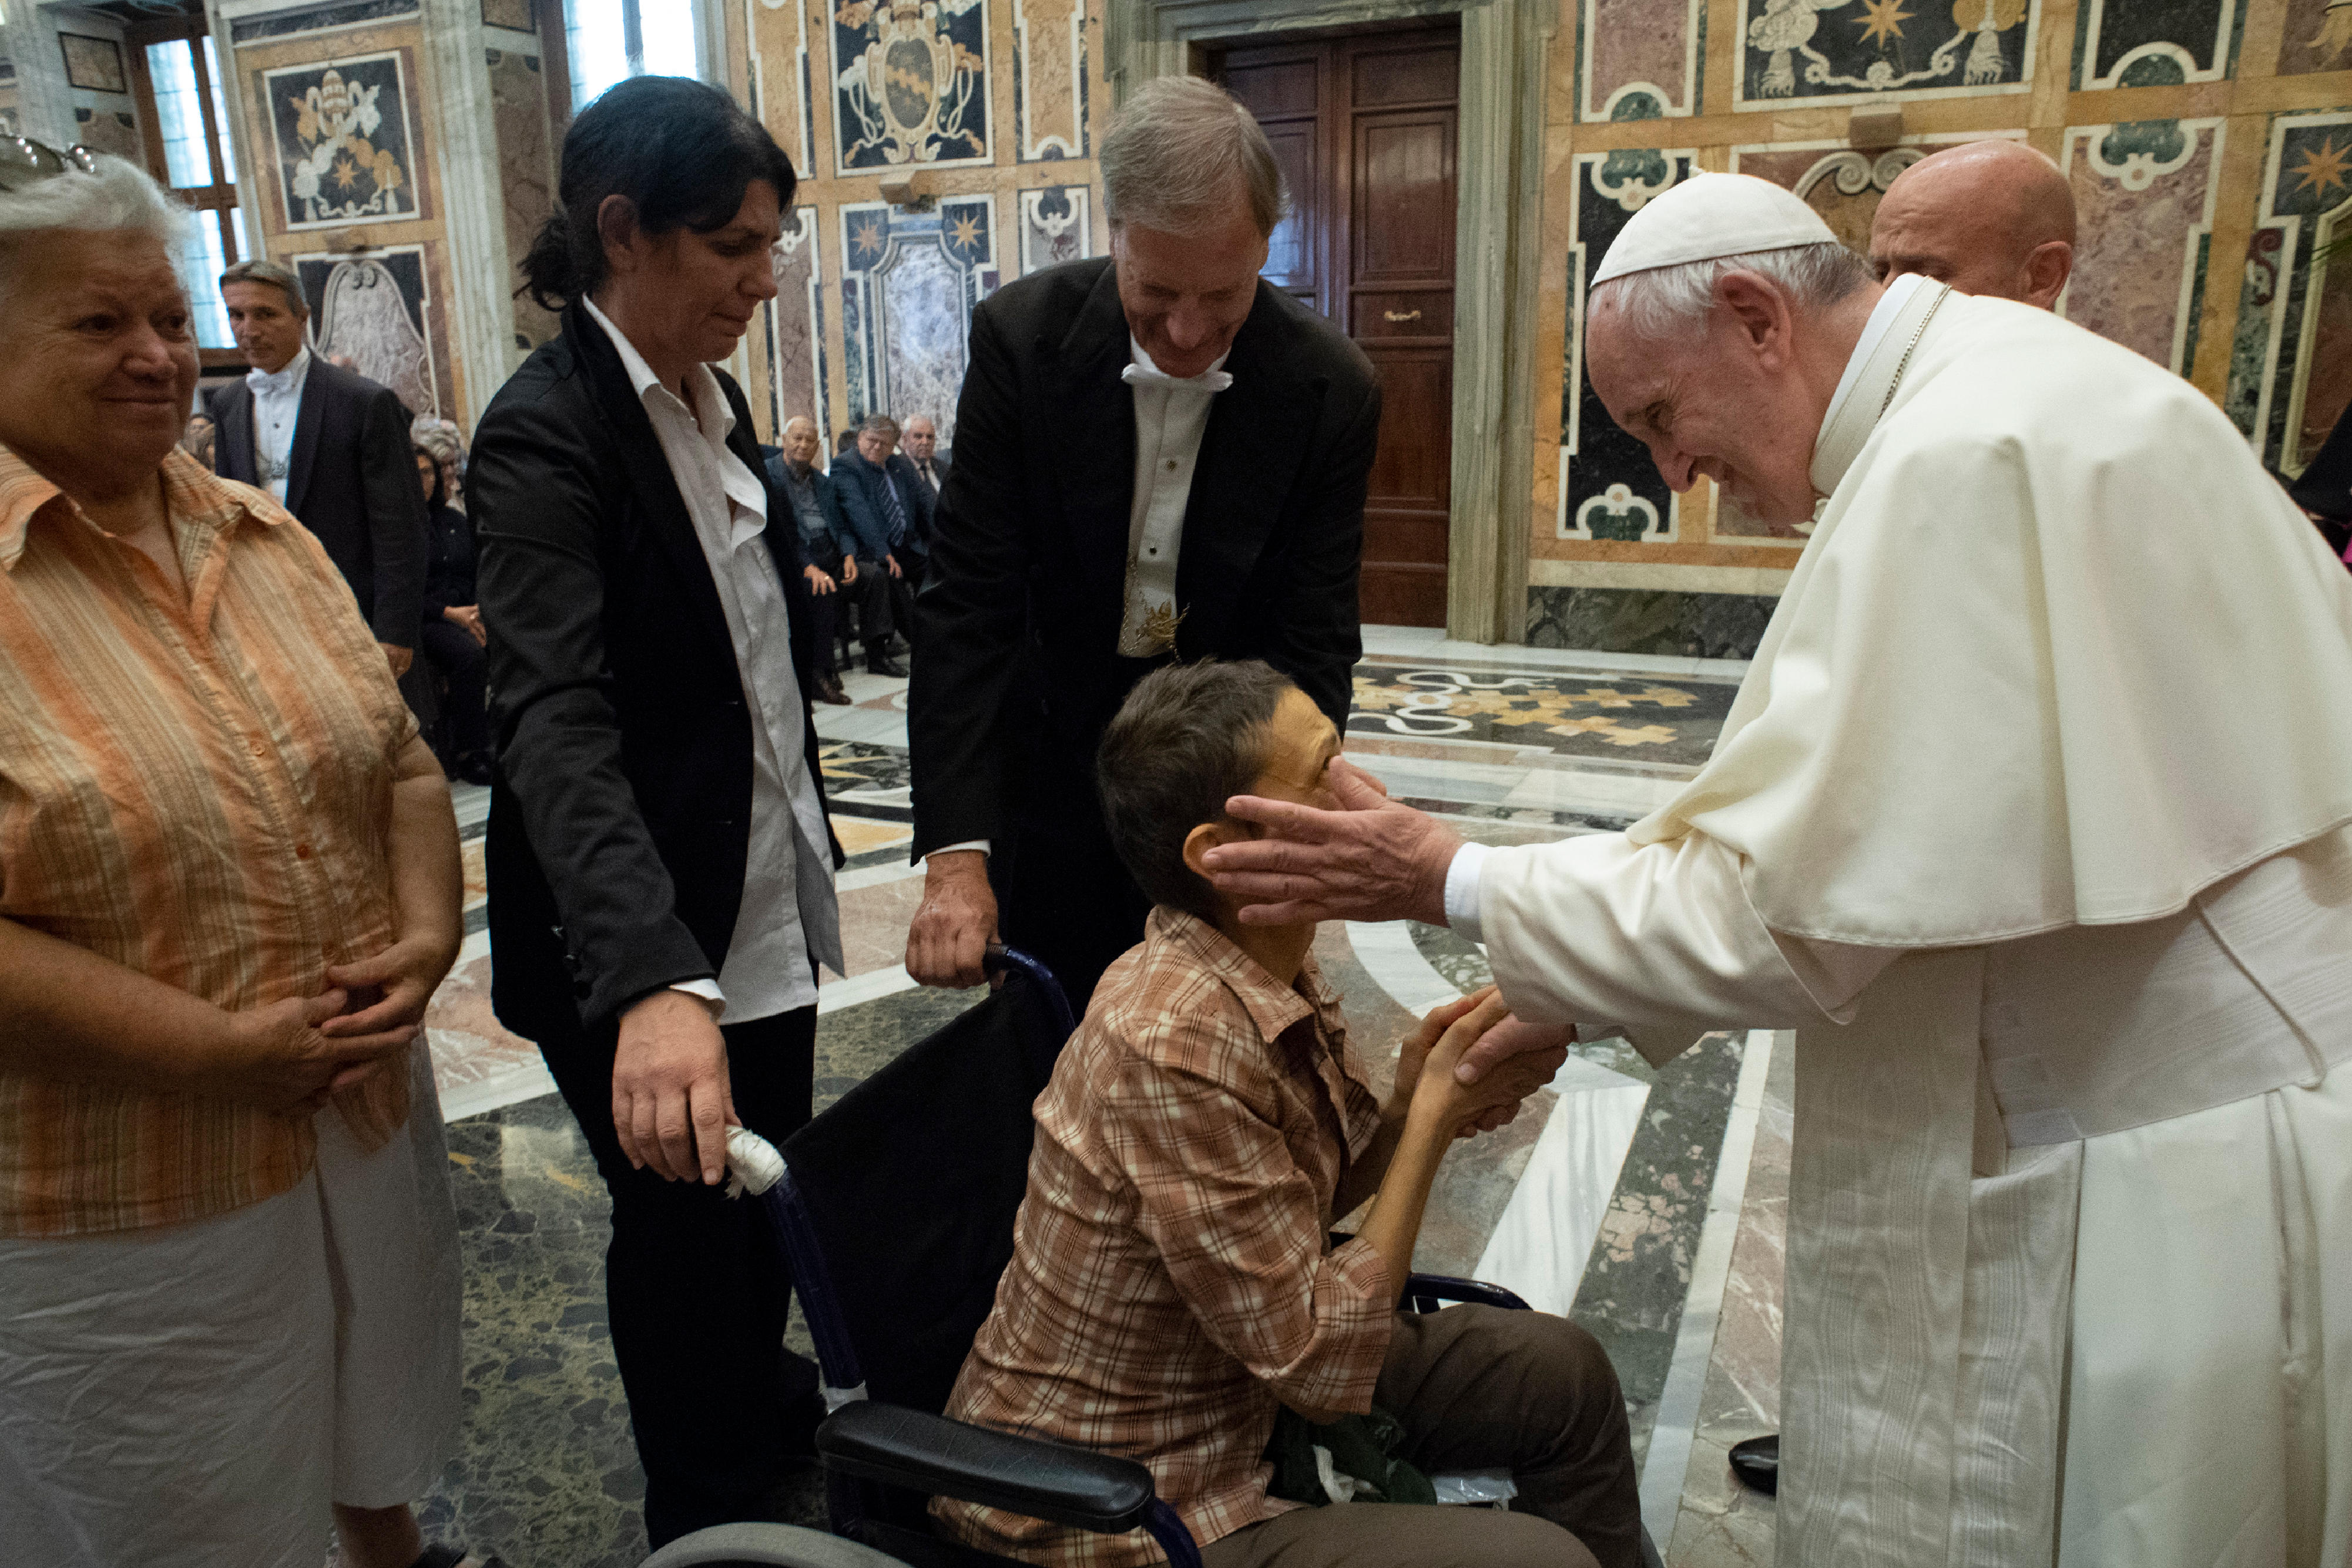 El Santo Padre bendice a un trabajador inválido © Vatican Media